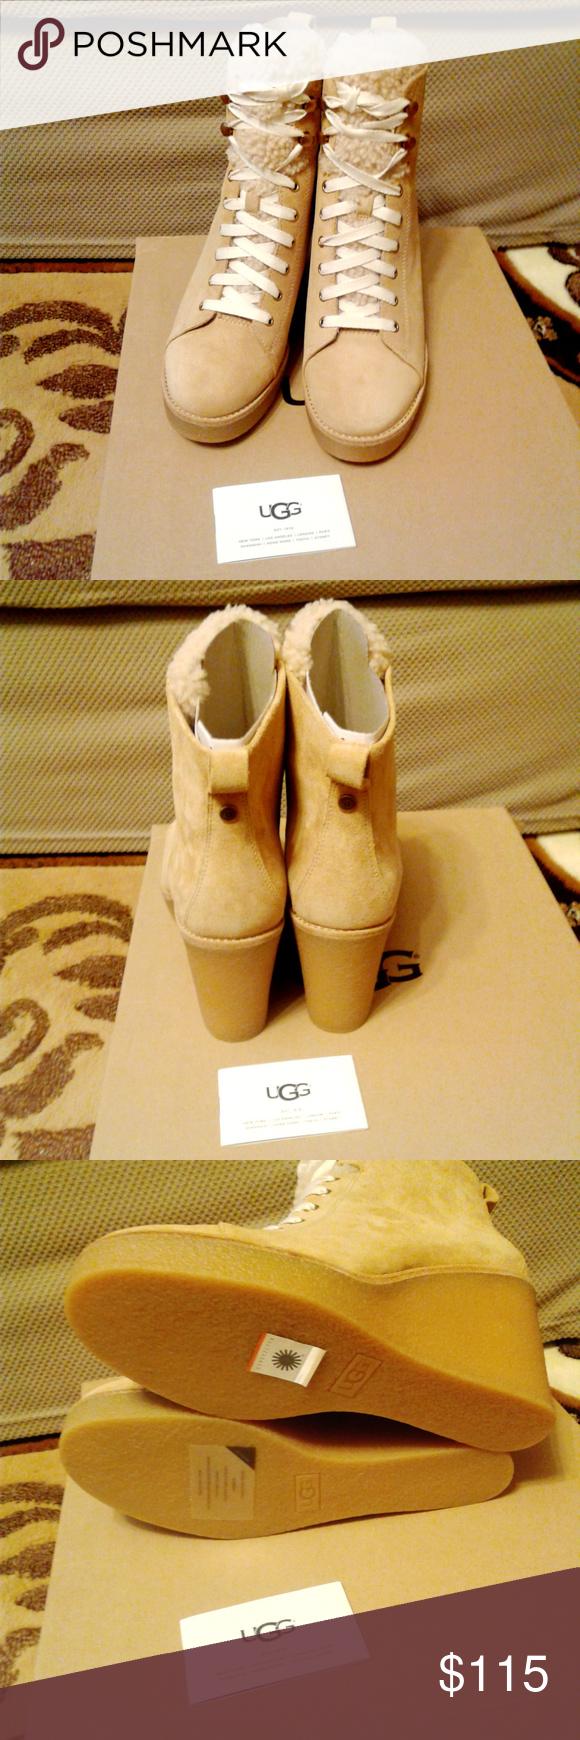 f7bd75f330c UGG Women's Kiernan Slouch Boot honey color sz 10M brand new in box ...